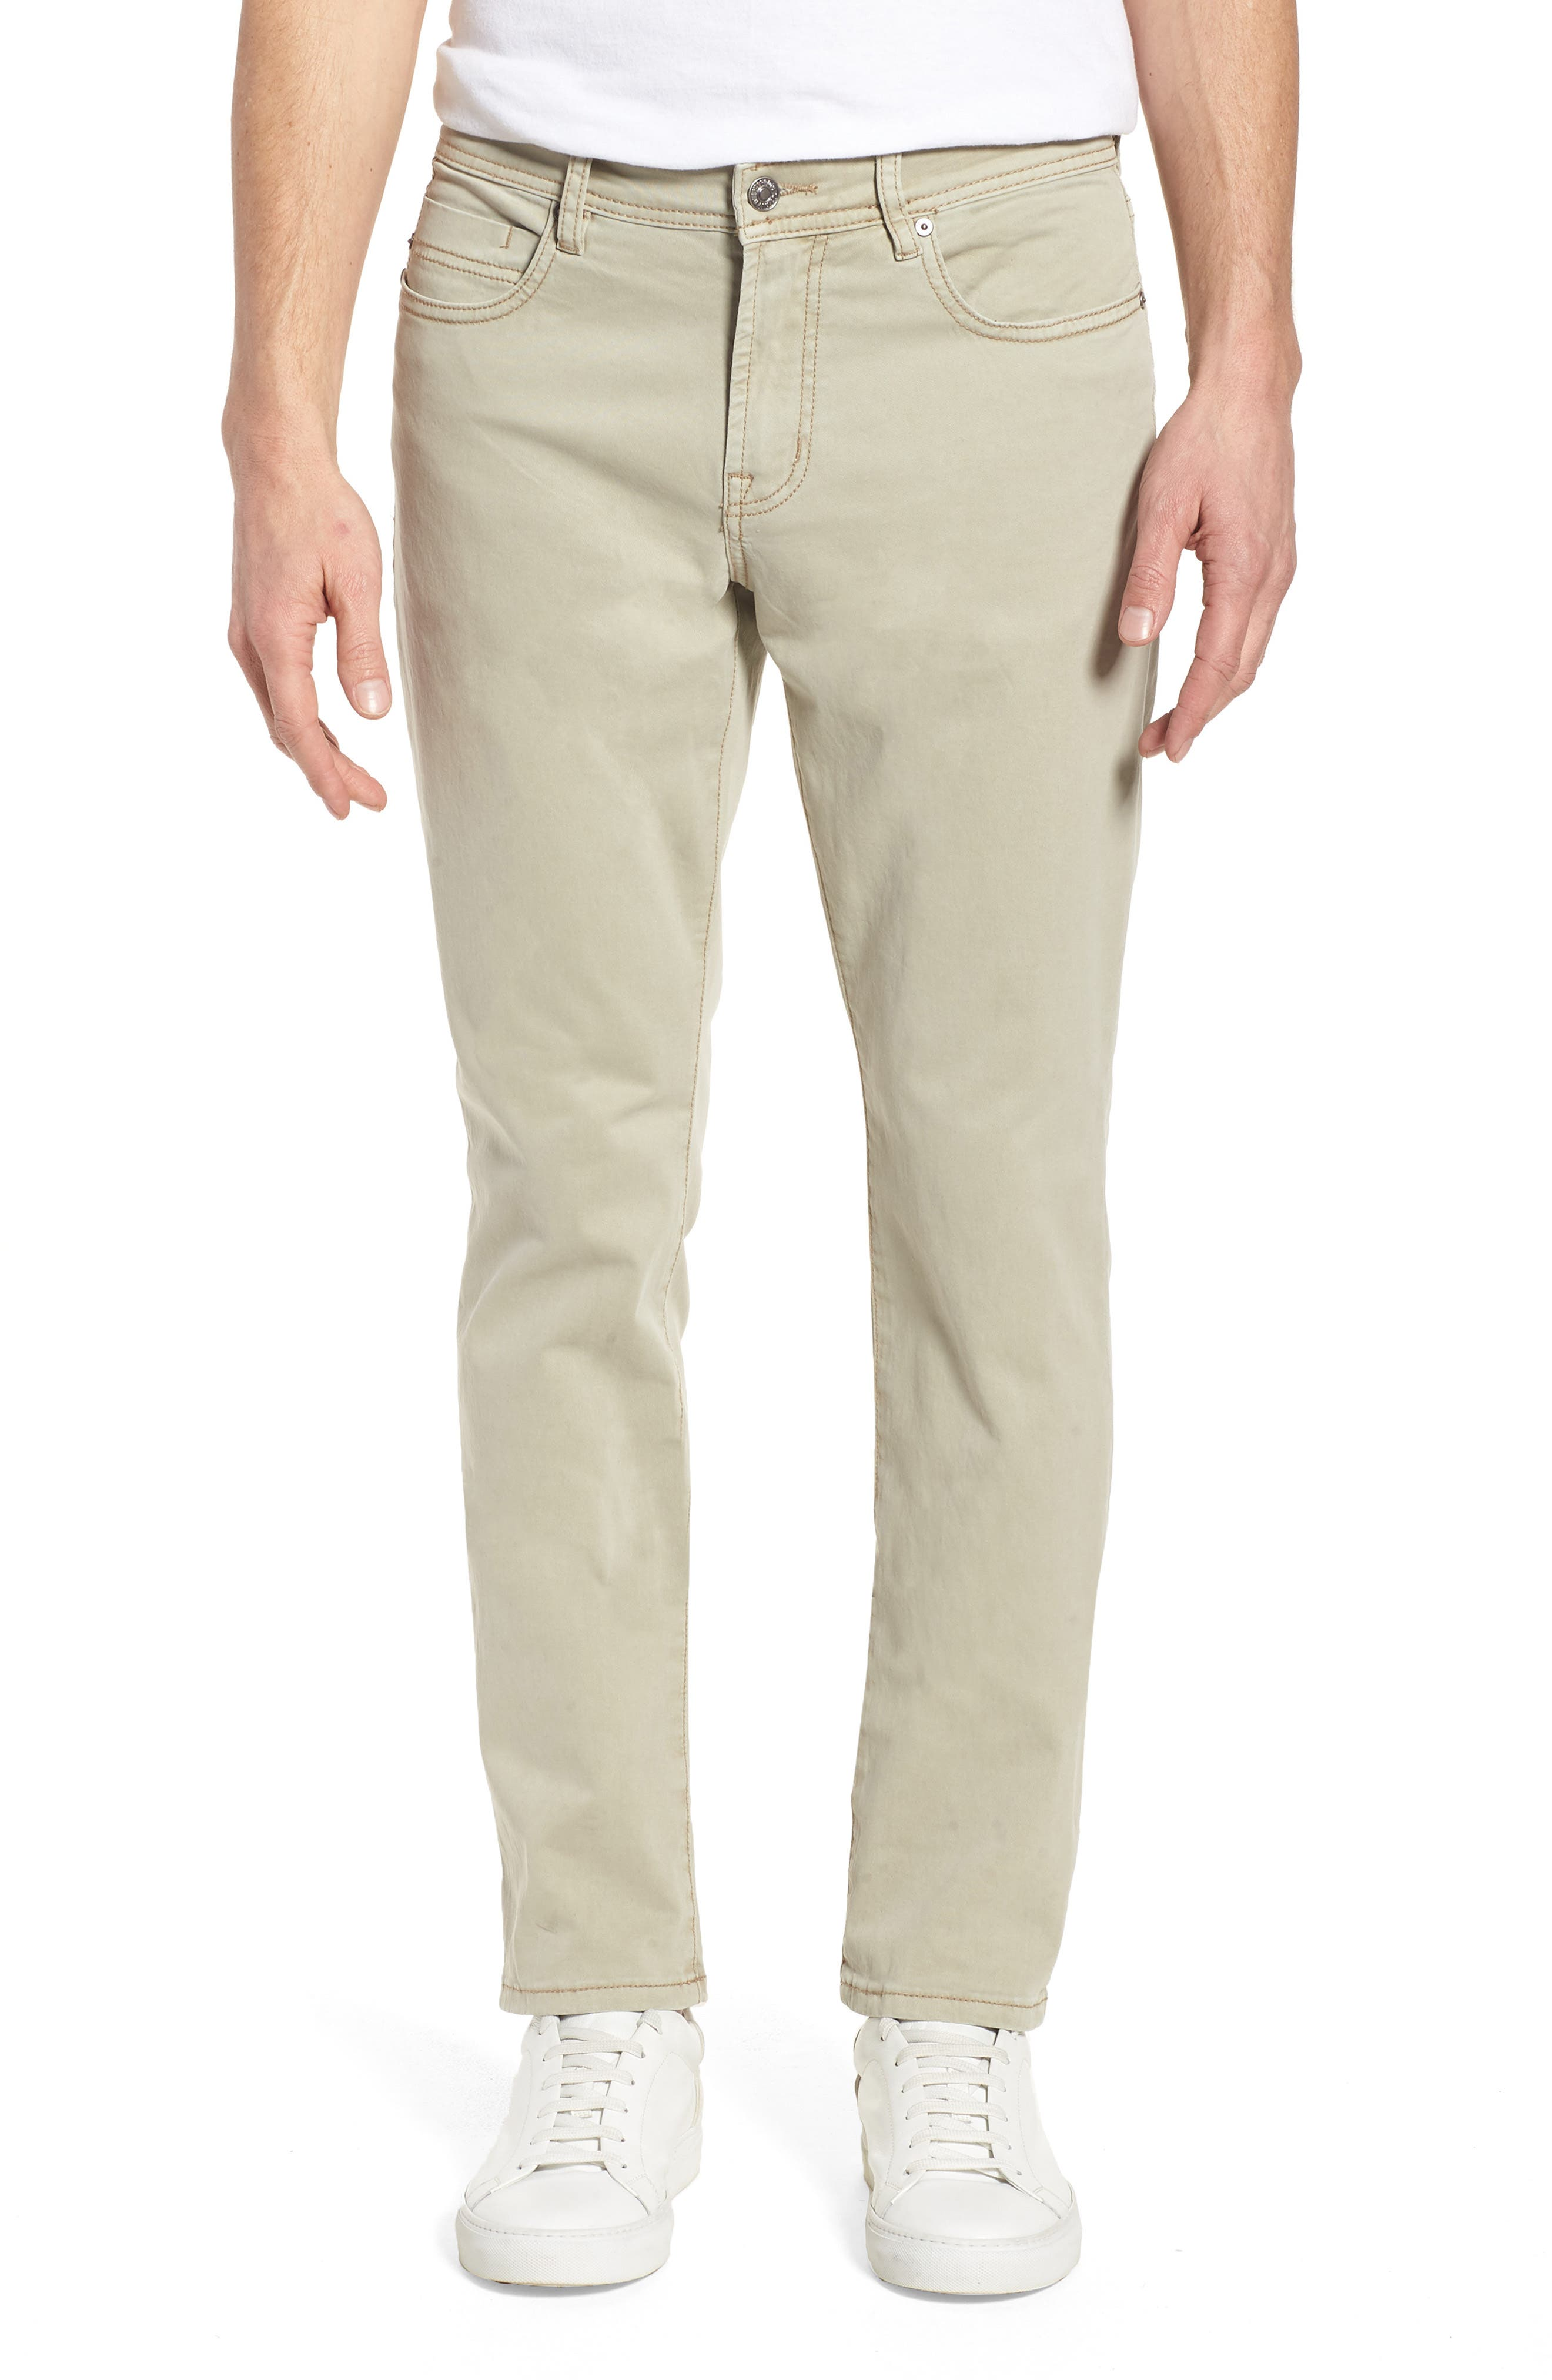 Jeans Co. Slim Straight Leg Jeans,                         Main,                         color, Sandstrom